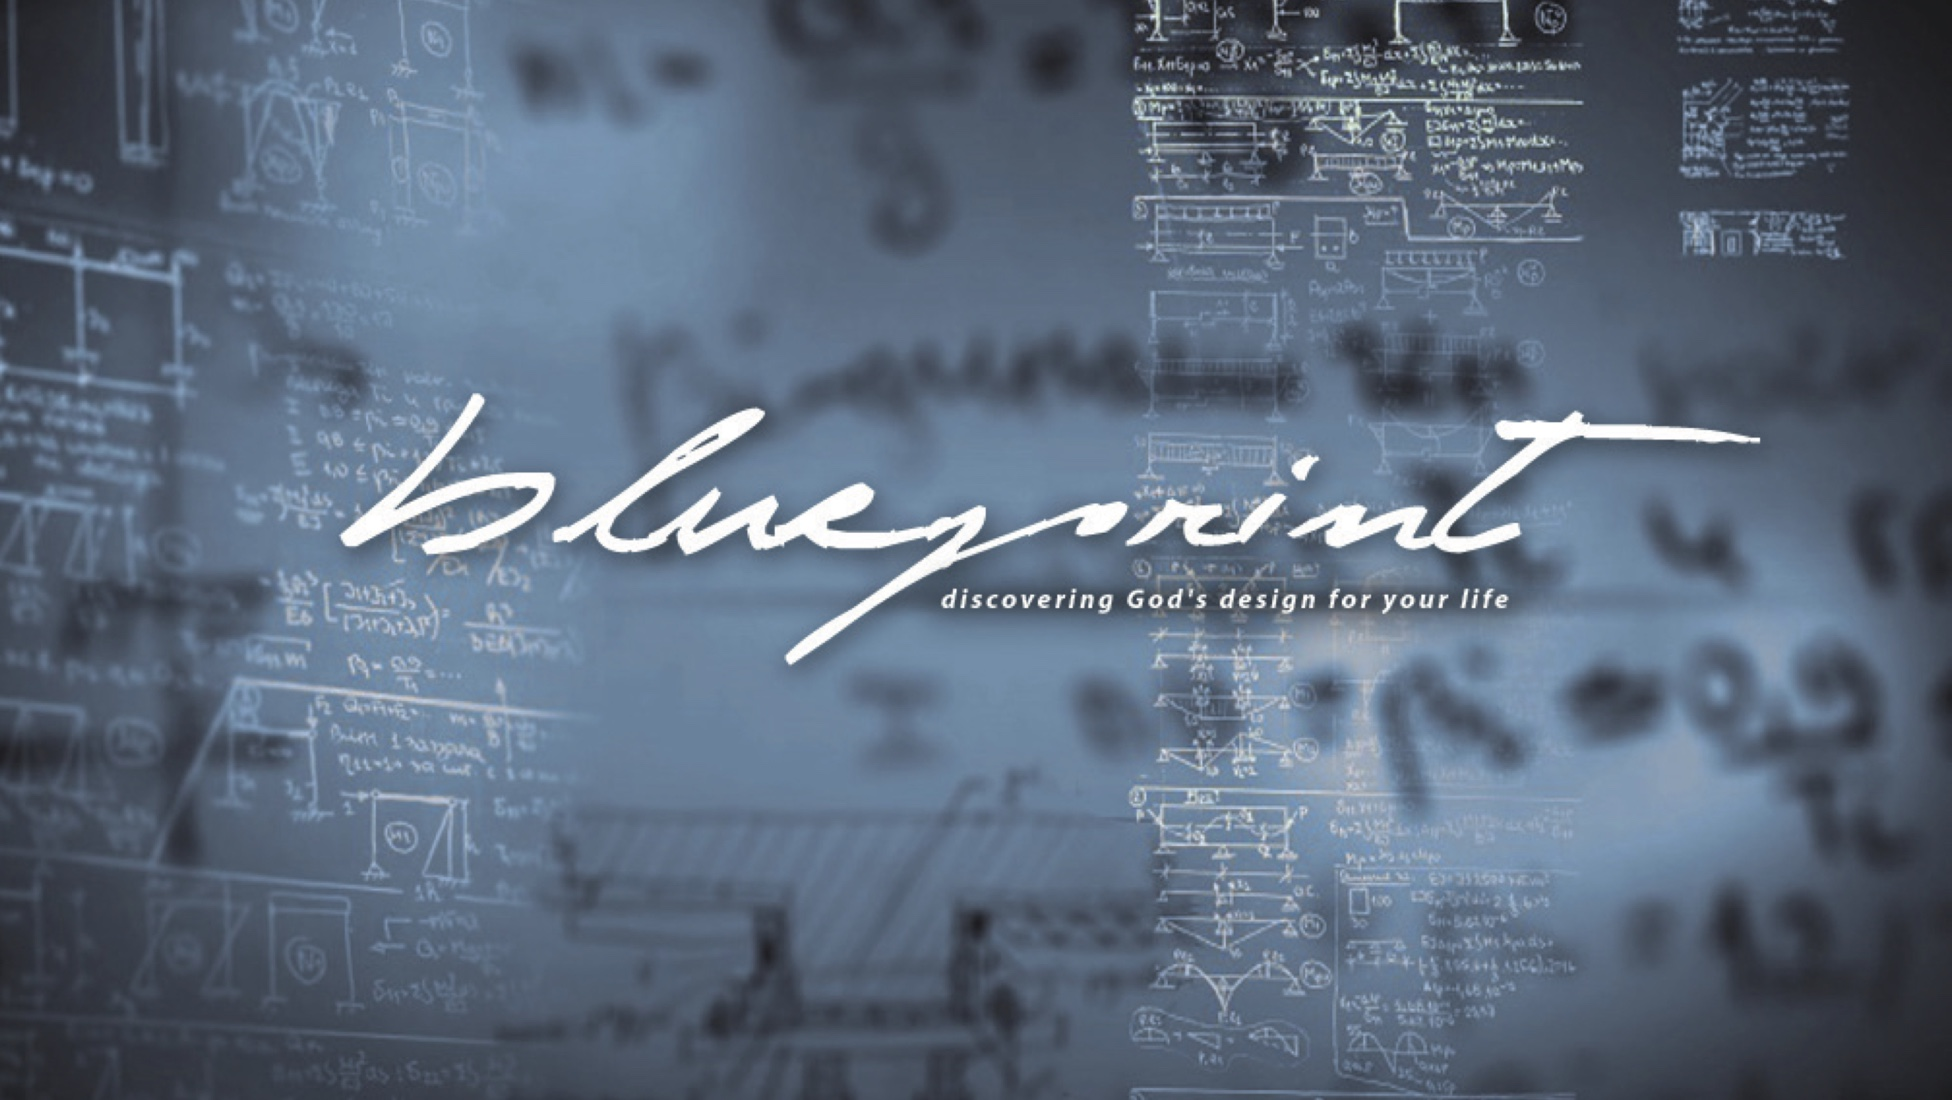 Interdependence awakening church blueprint malvernweather Gallery